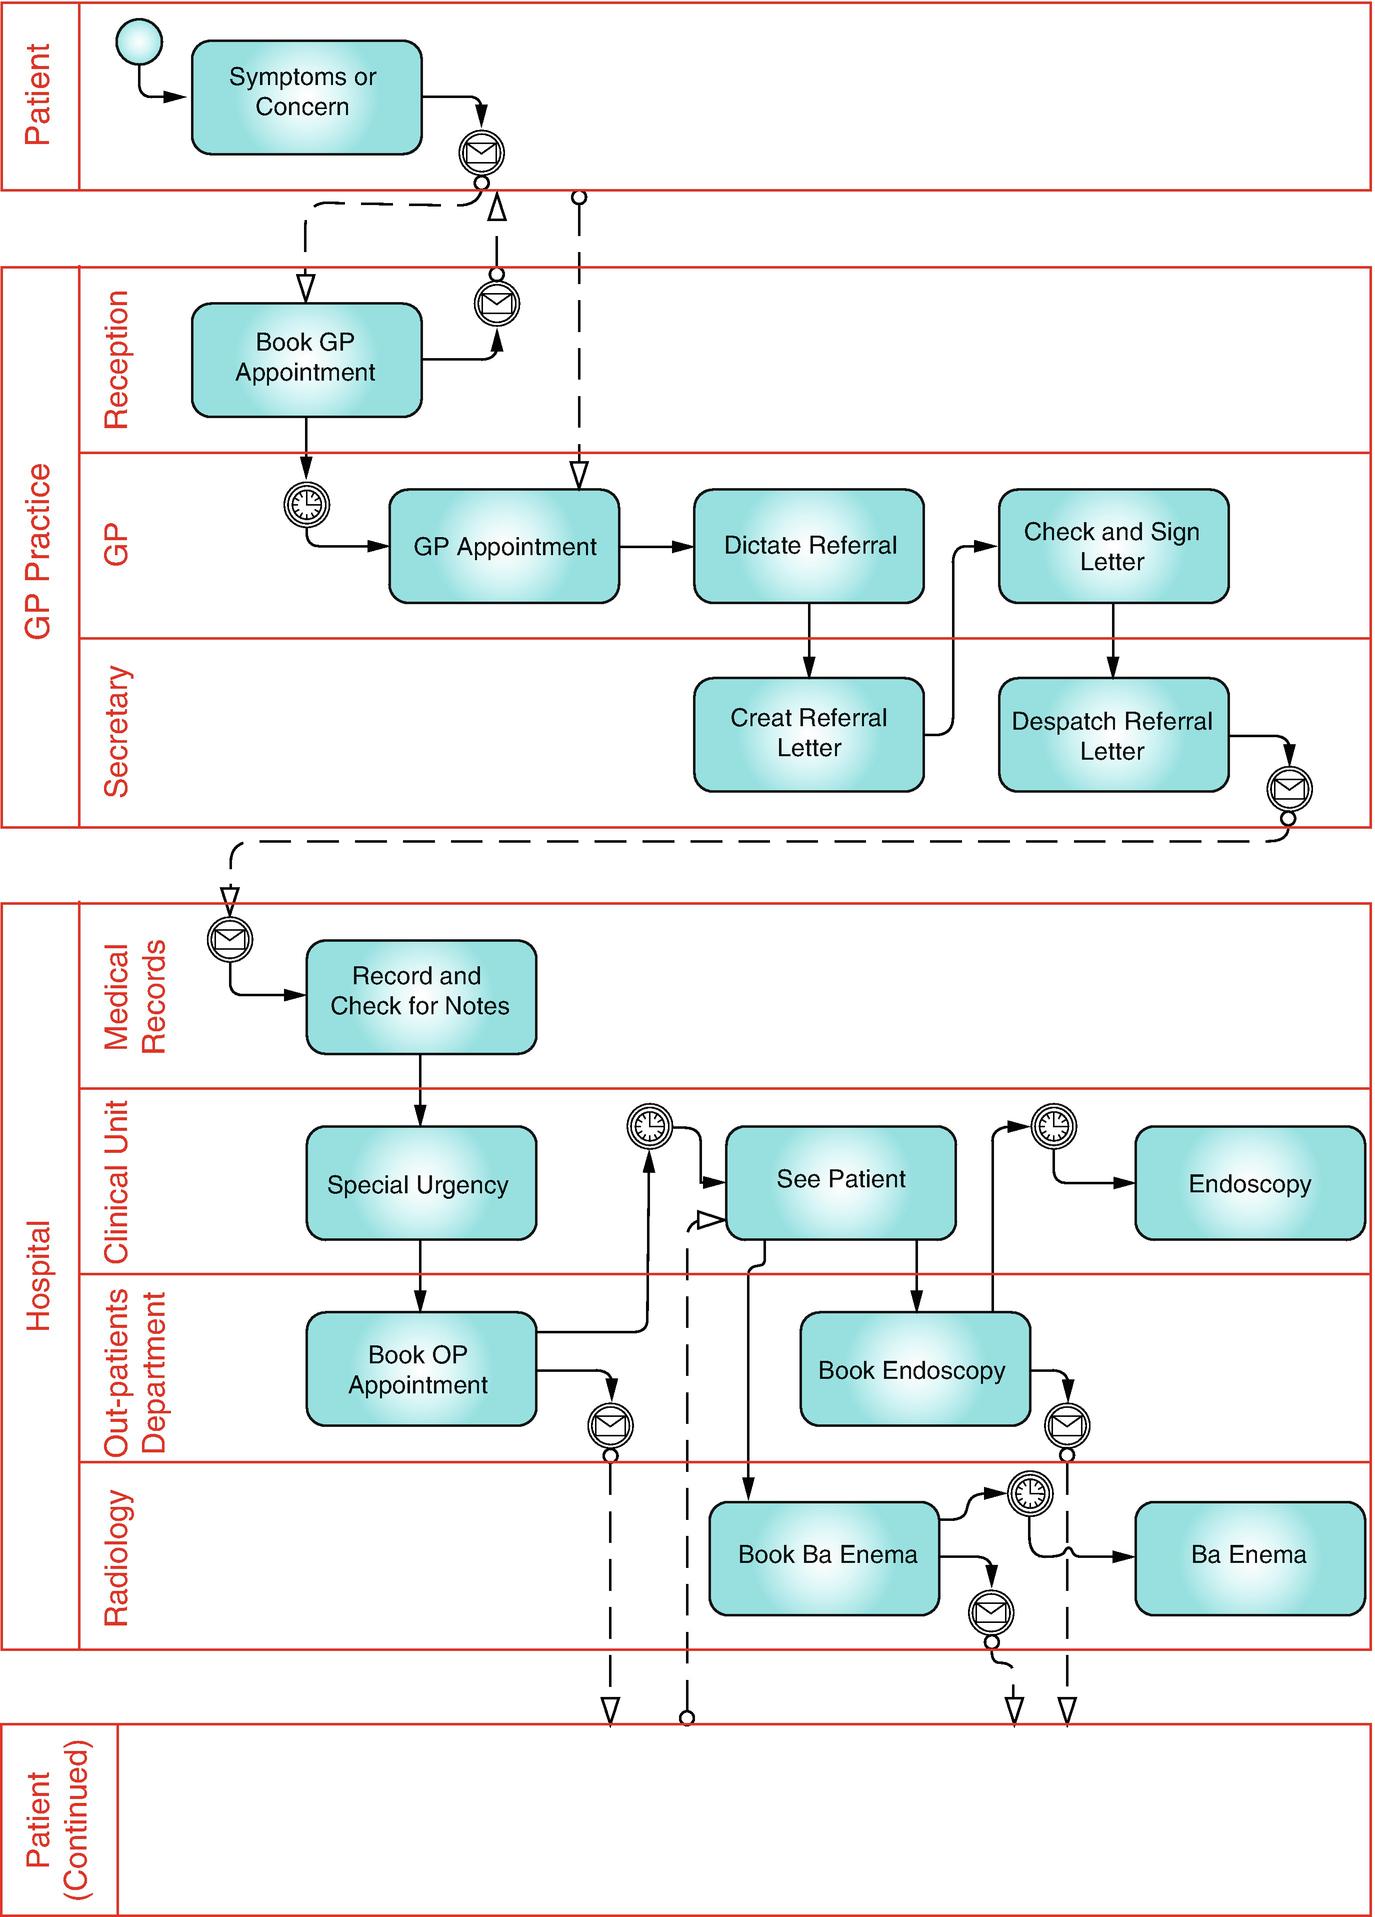 Json To Uml Diagram Online